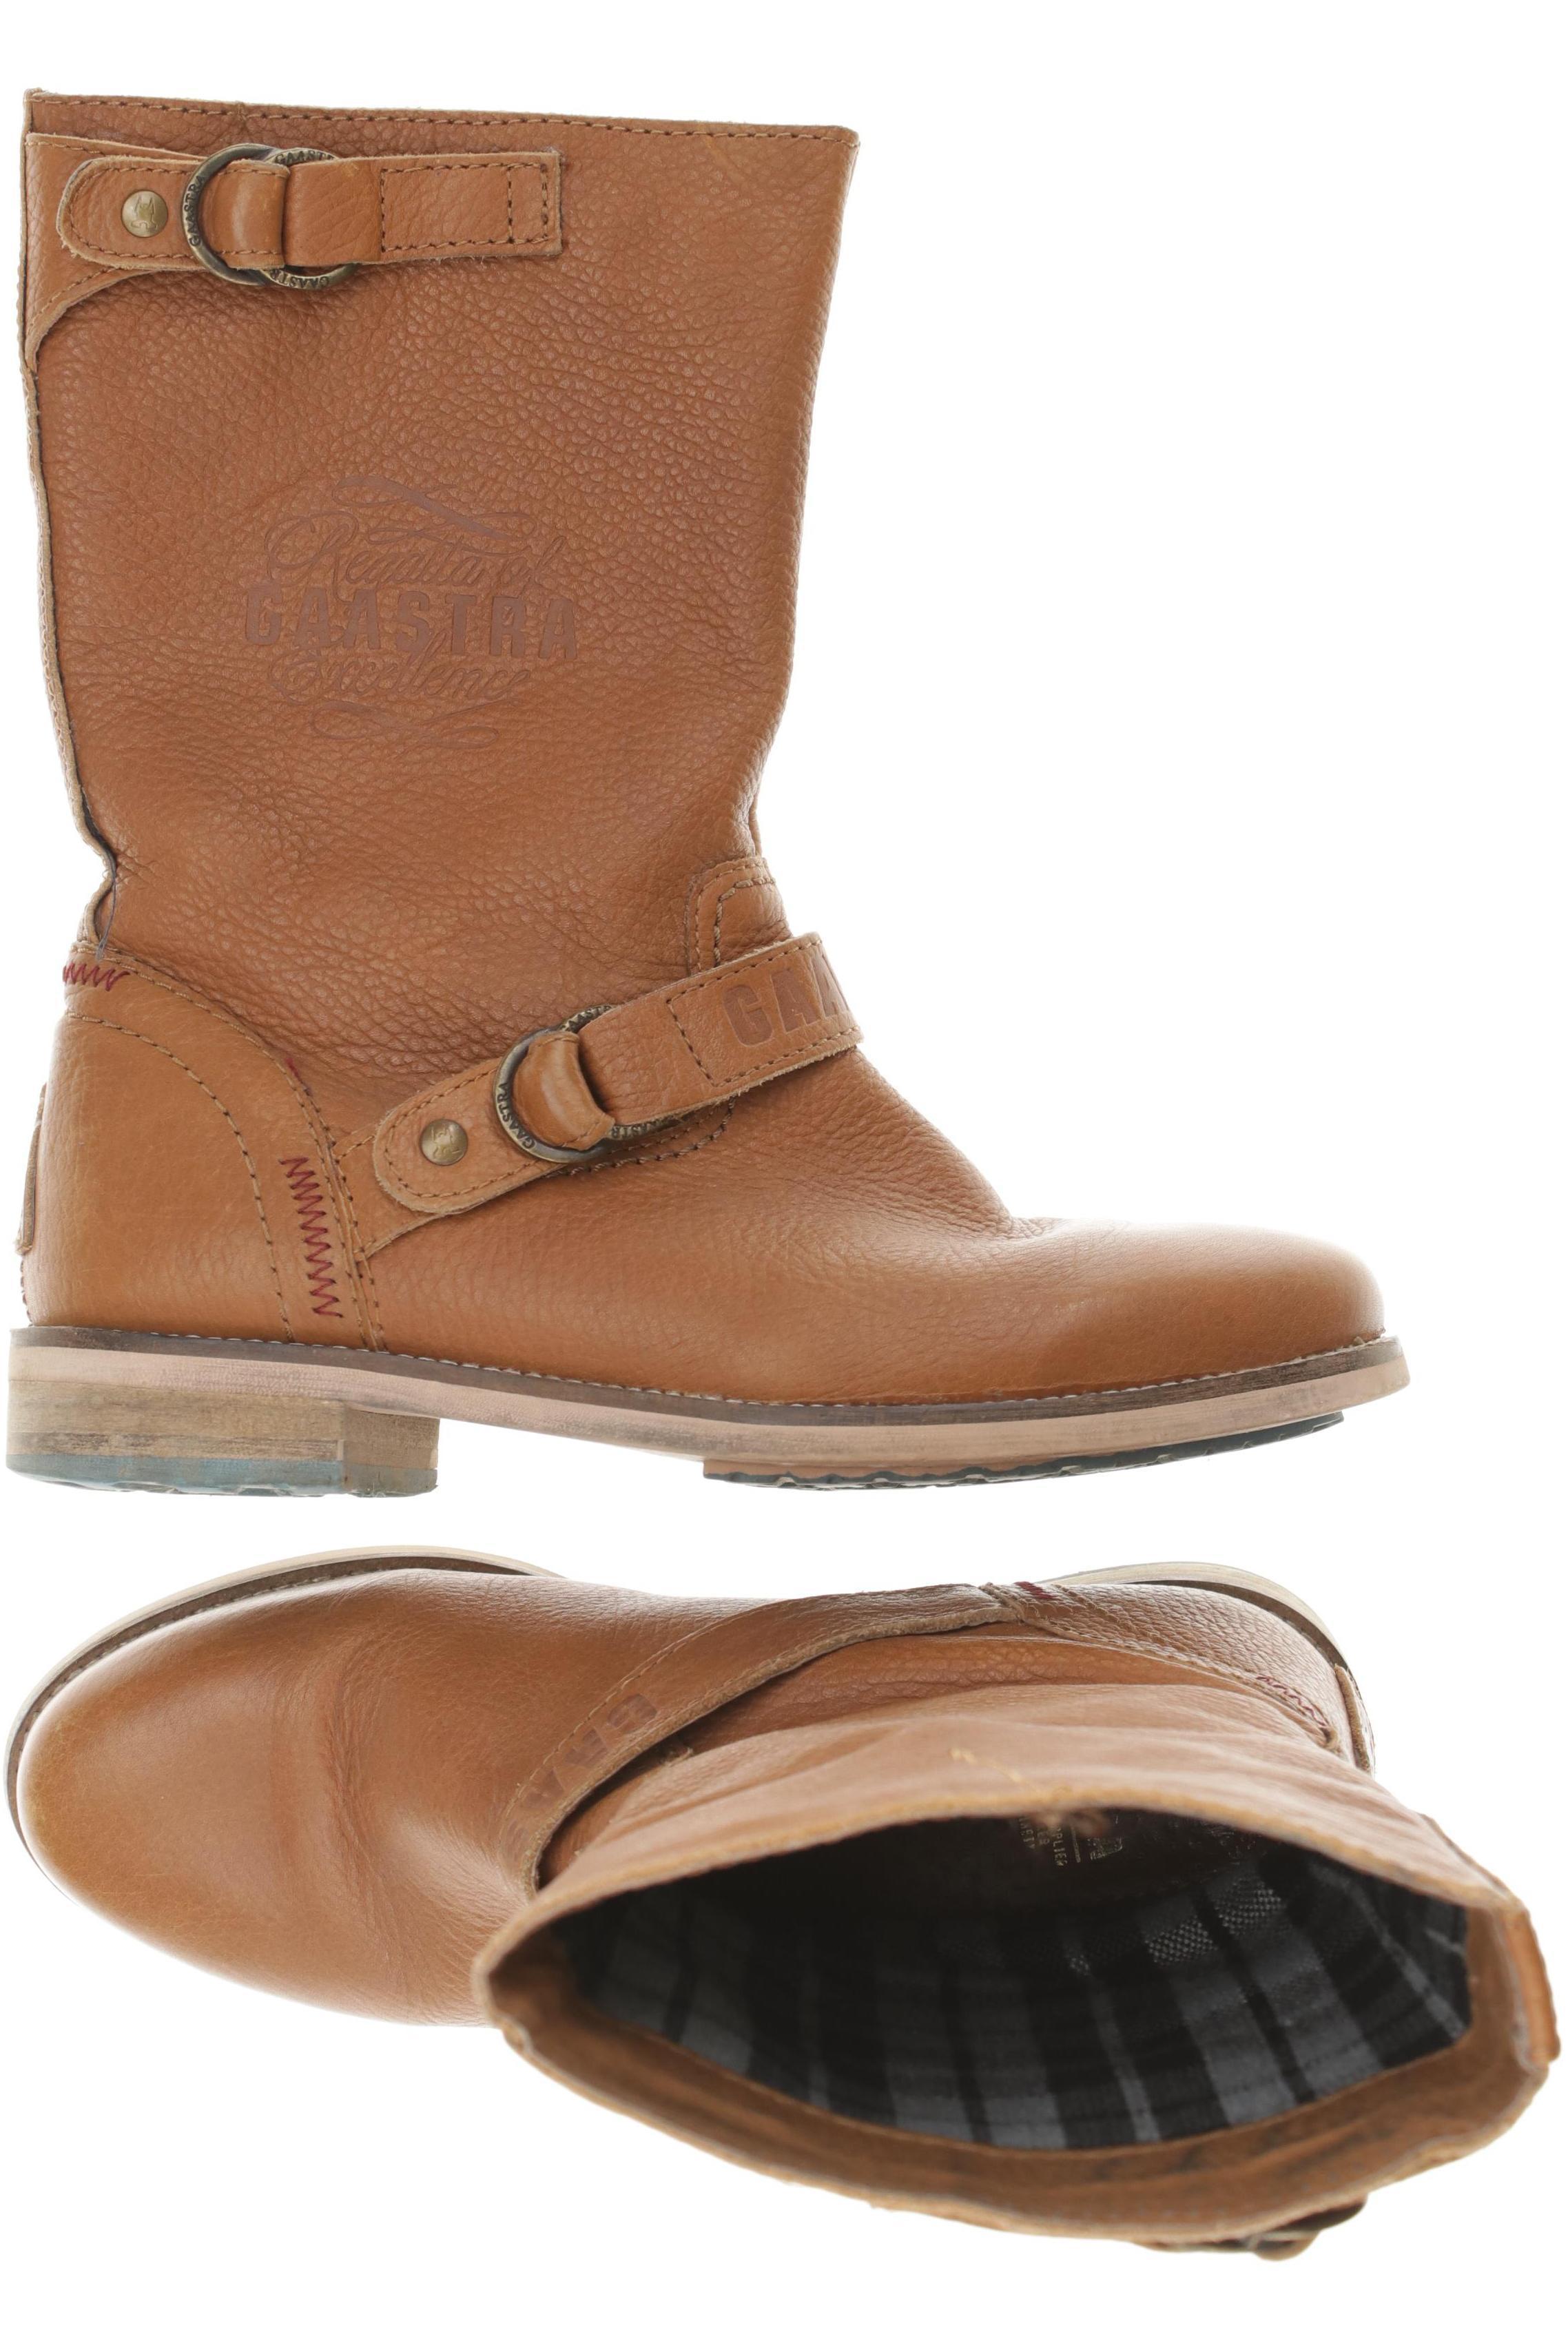 Gaastra Damen Stiefel DE 36 Second Hand kaufen